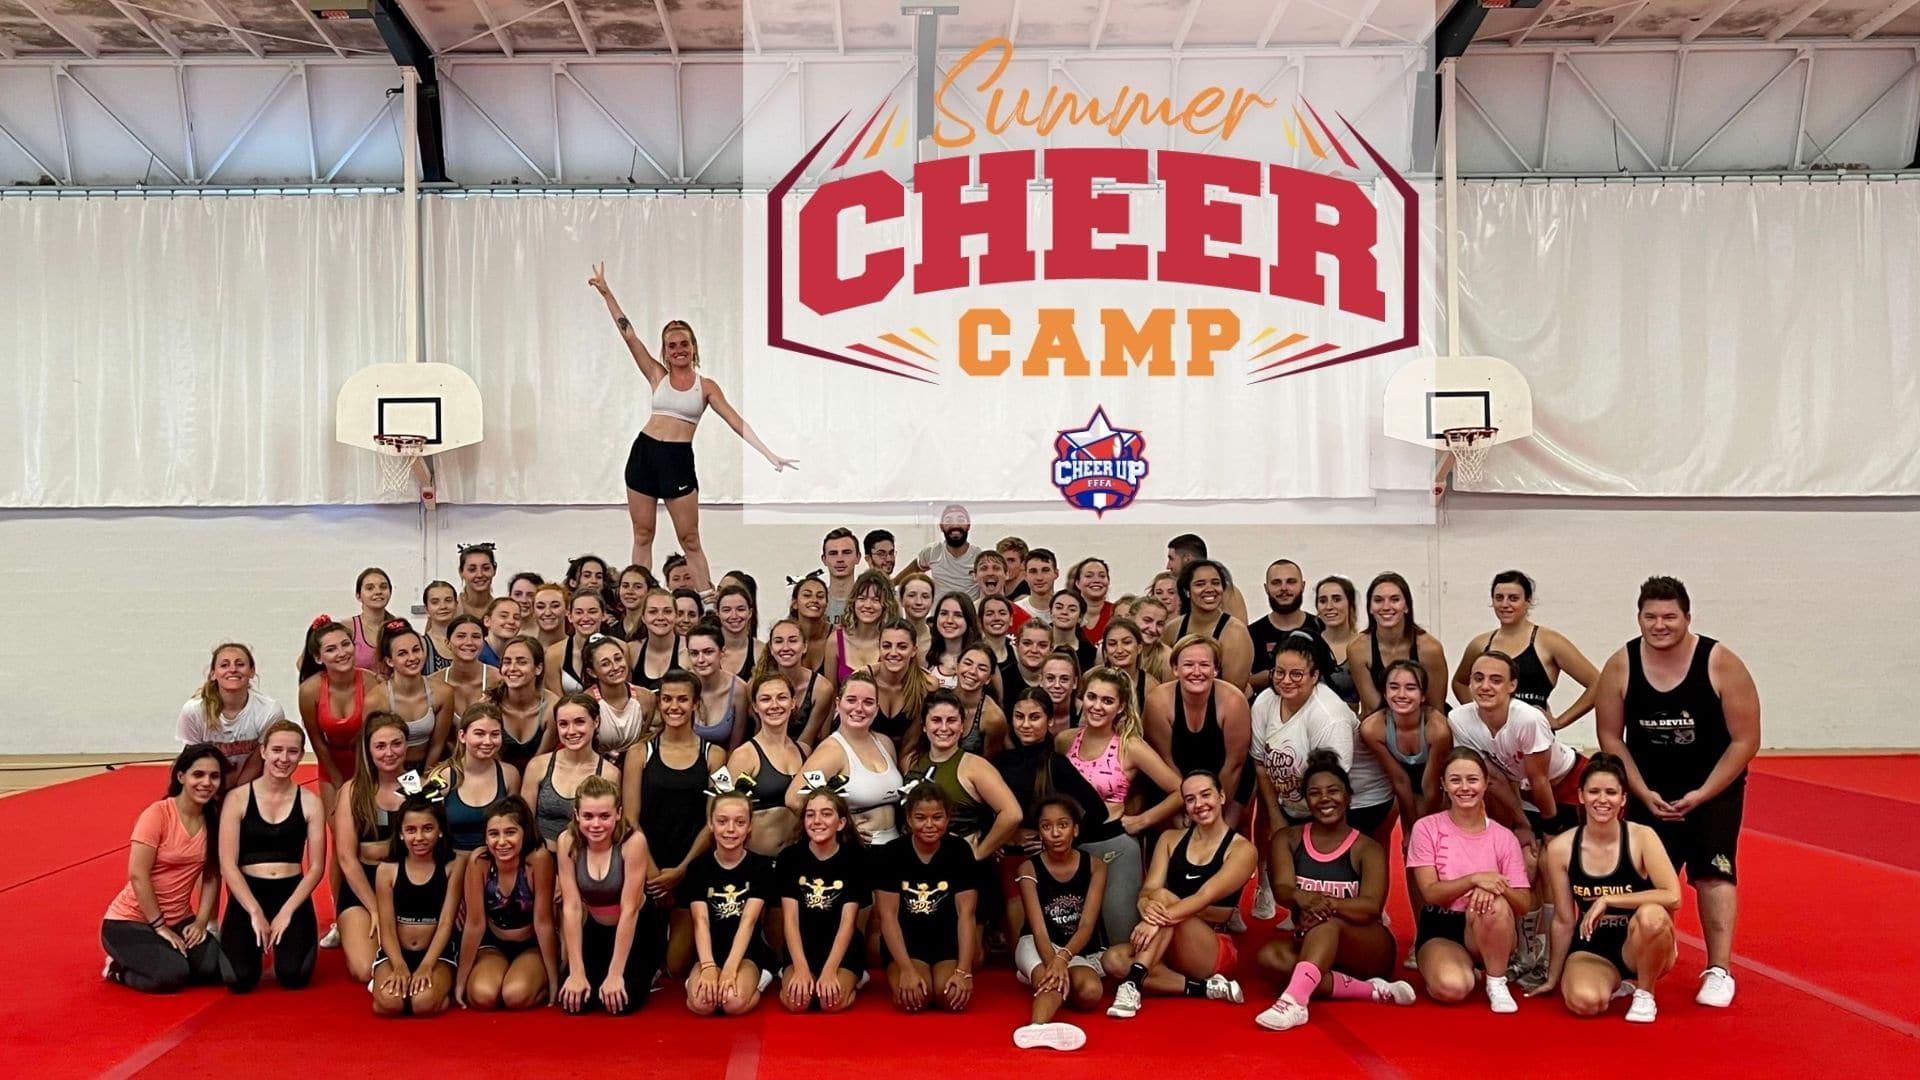 Summer Cheer Camp